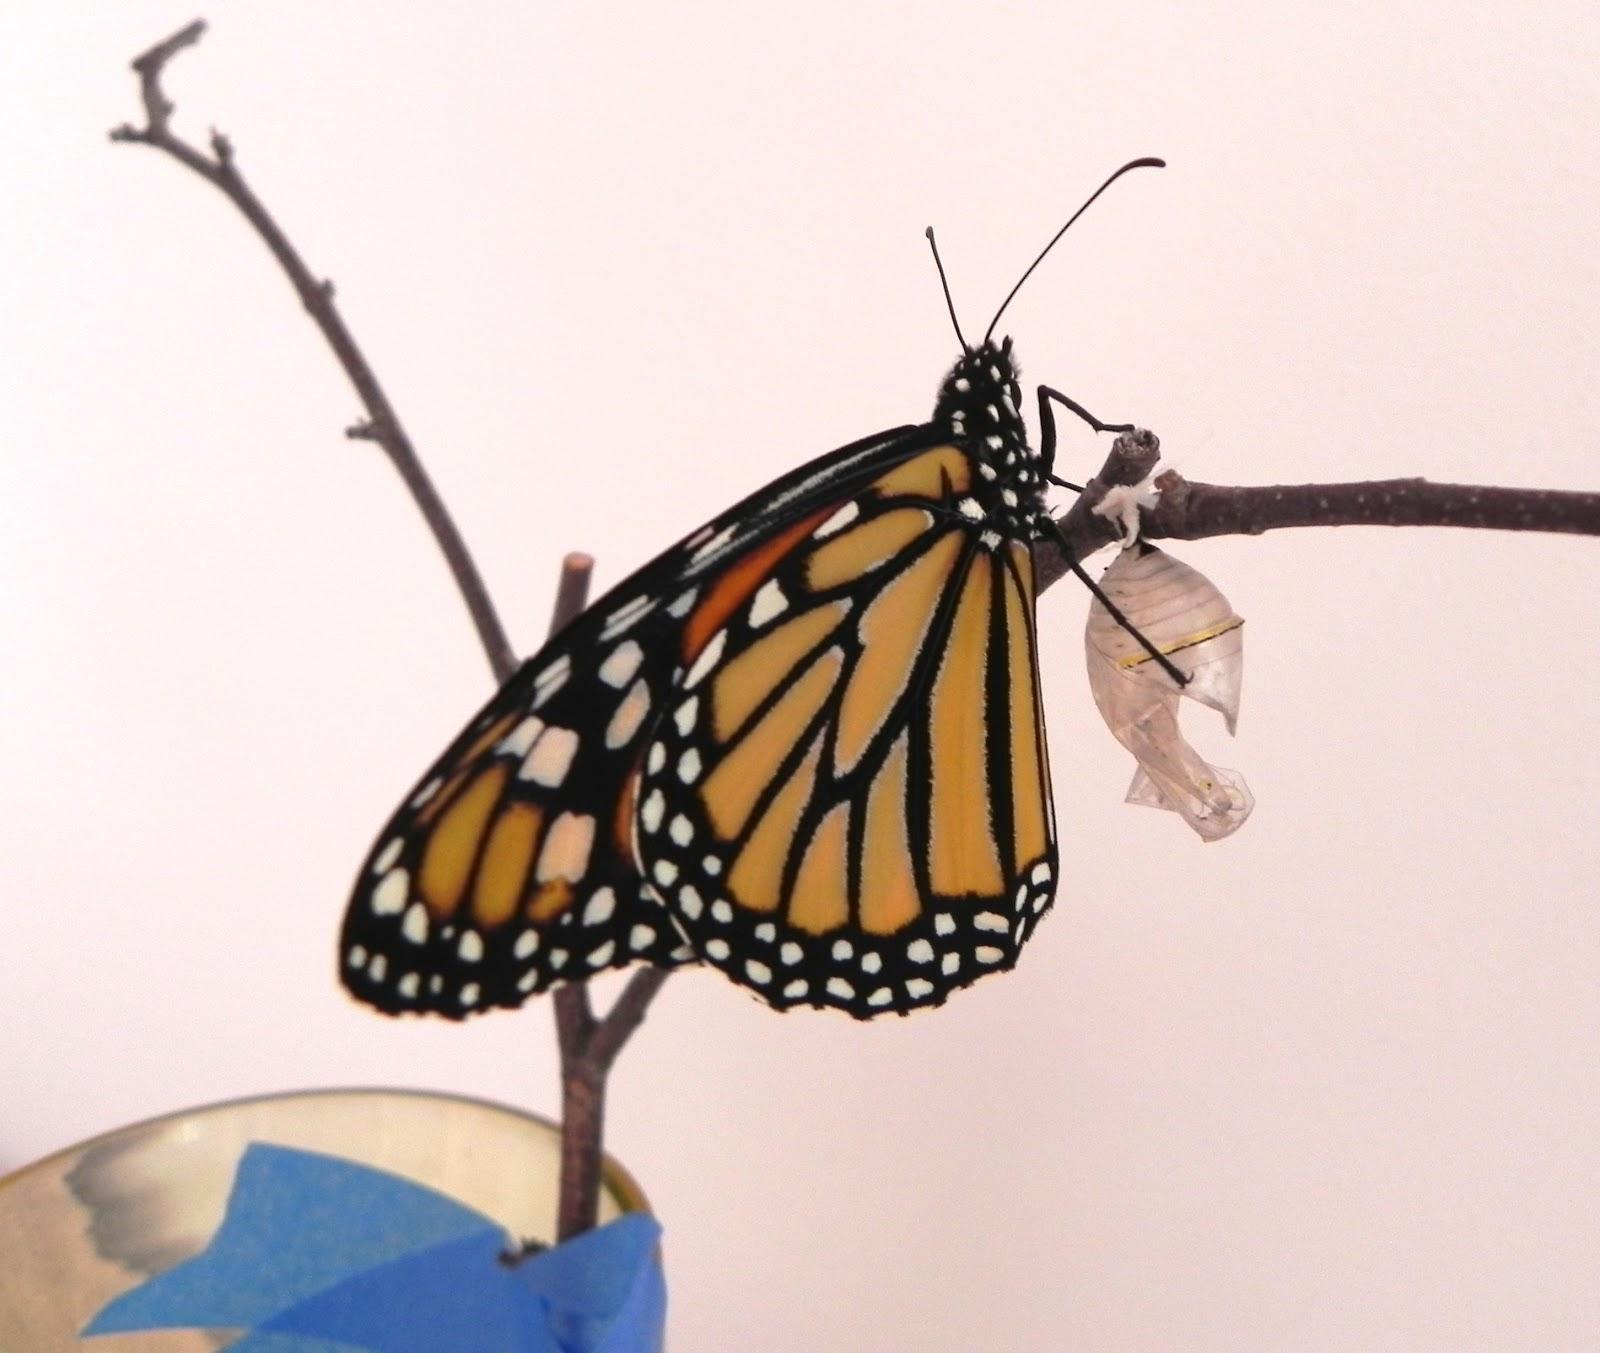 Last Monarch Of Season >> Tywkiwdbi Tai Wiki Widbee The Last Monarch Of The Year